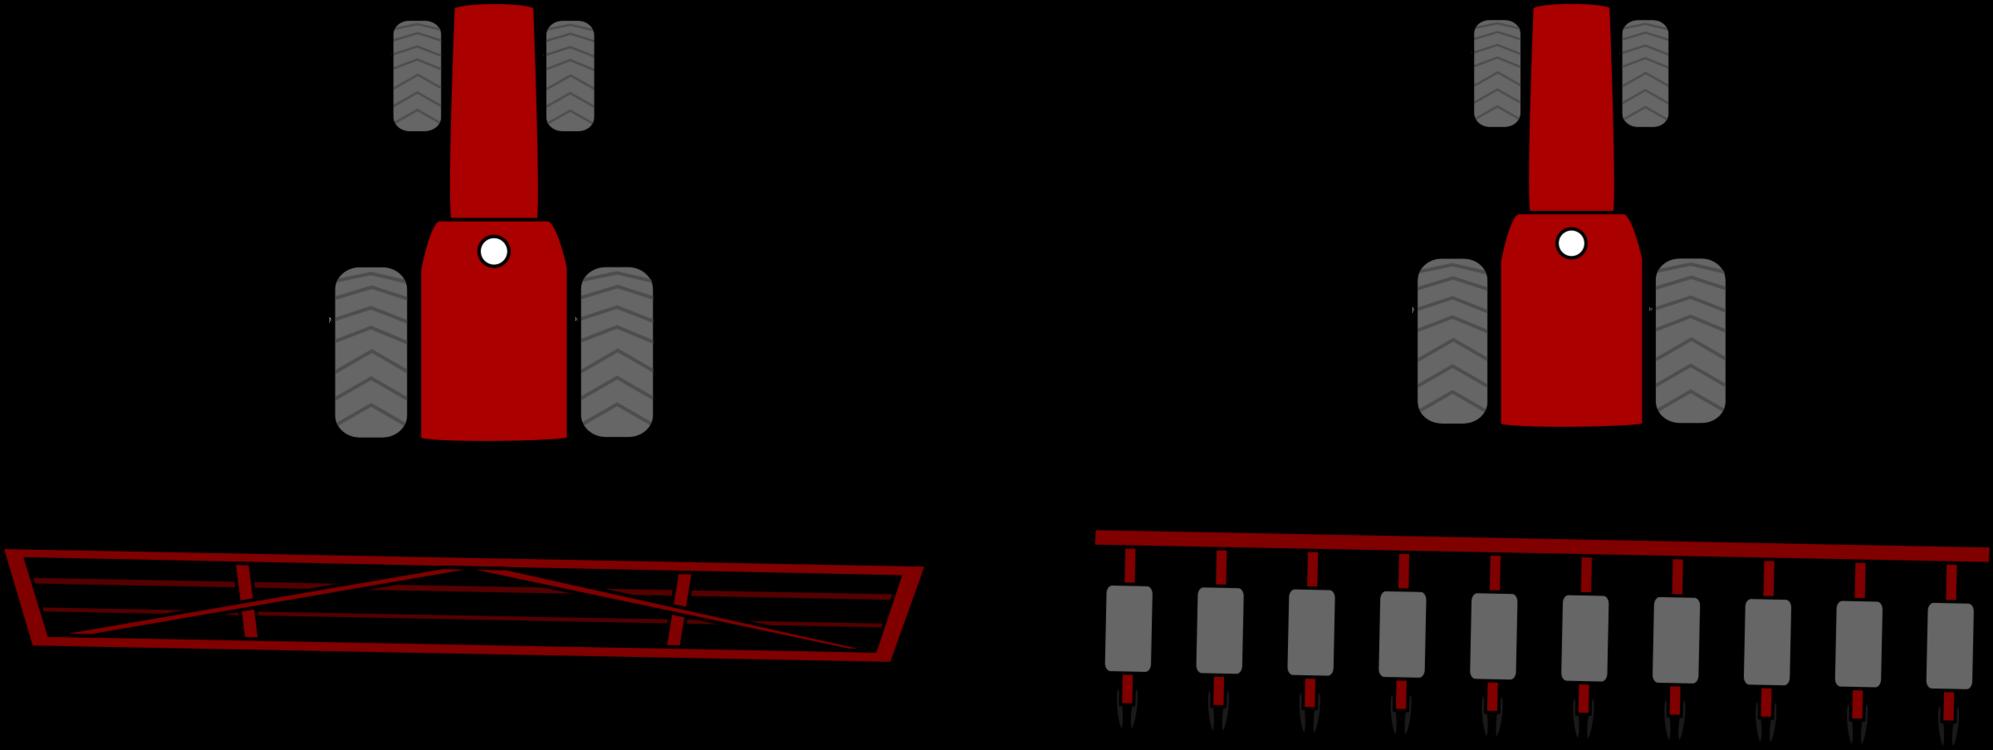 Audio,Angle,Line